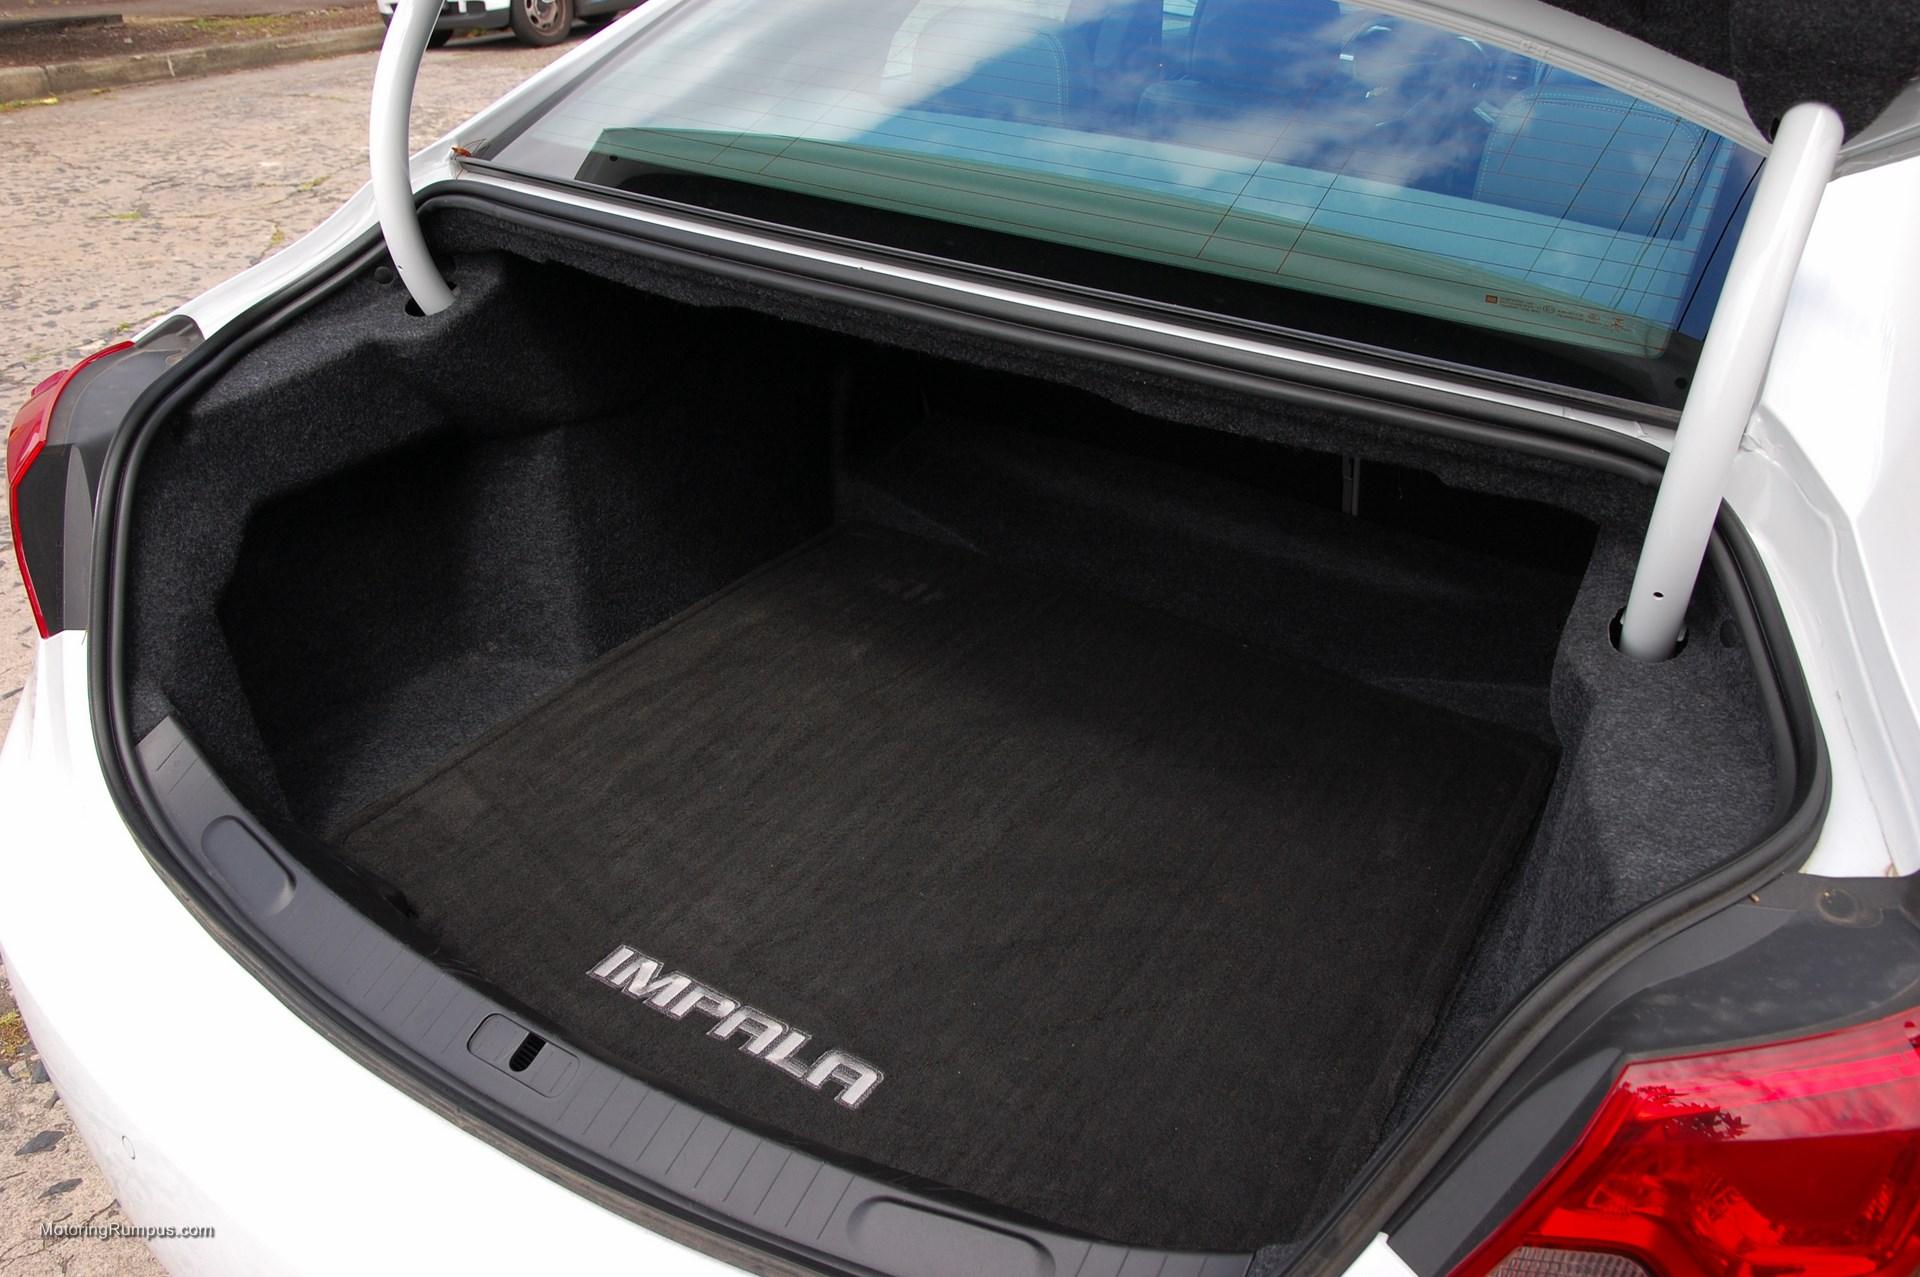 2014 Chevy Impala Trunk